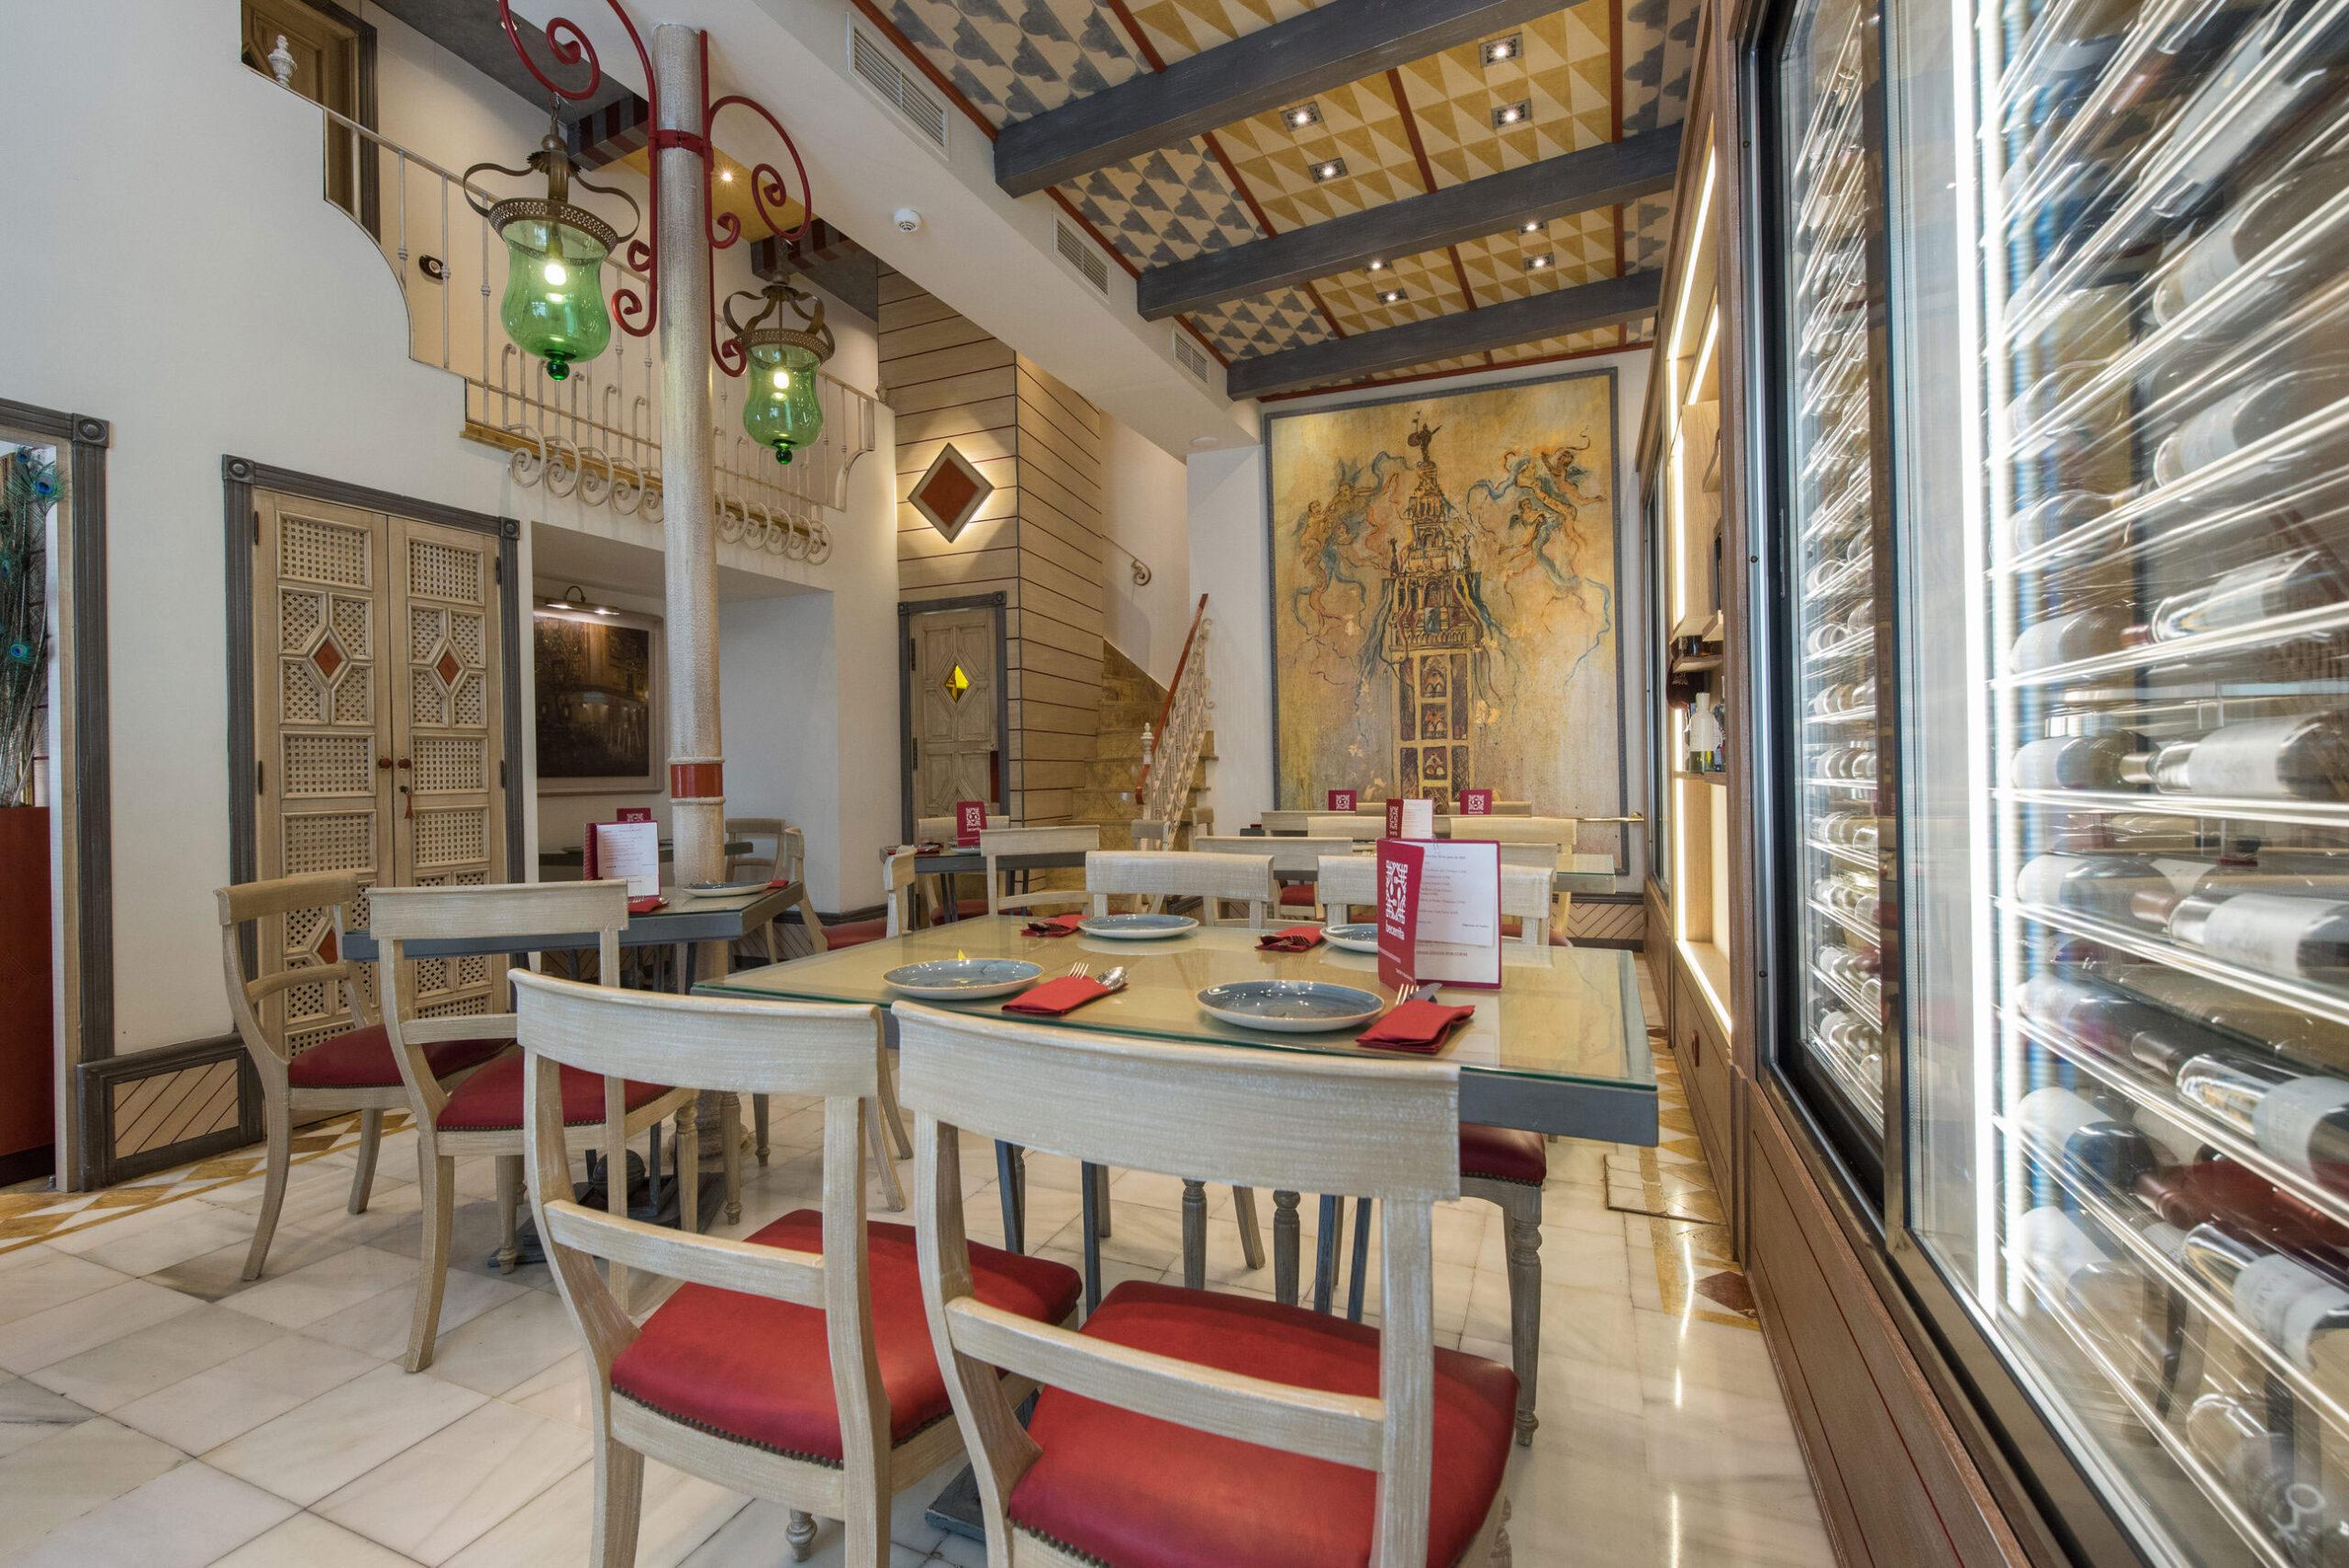 restaurante becerrita sevilla decoracion